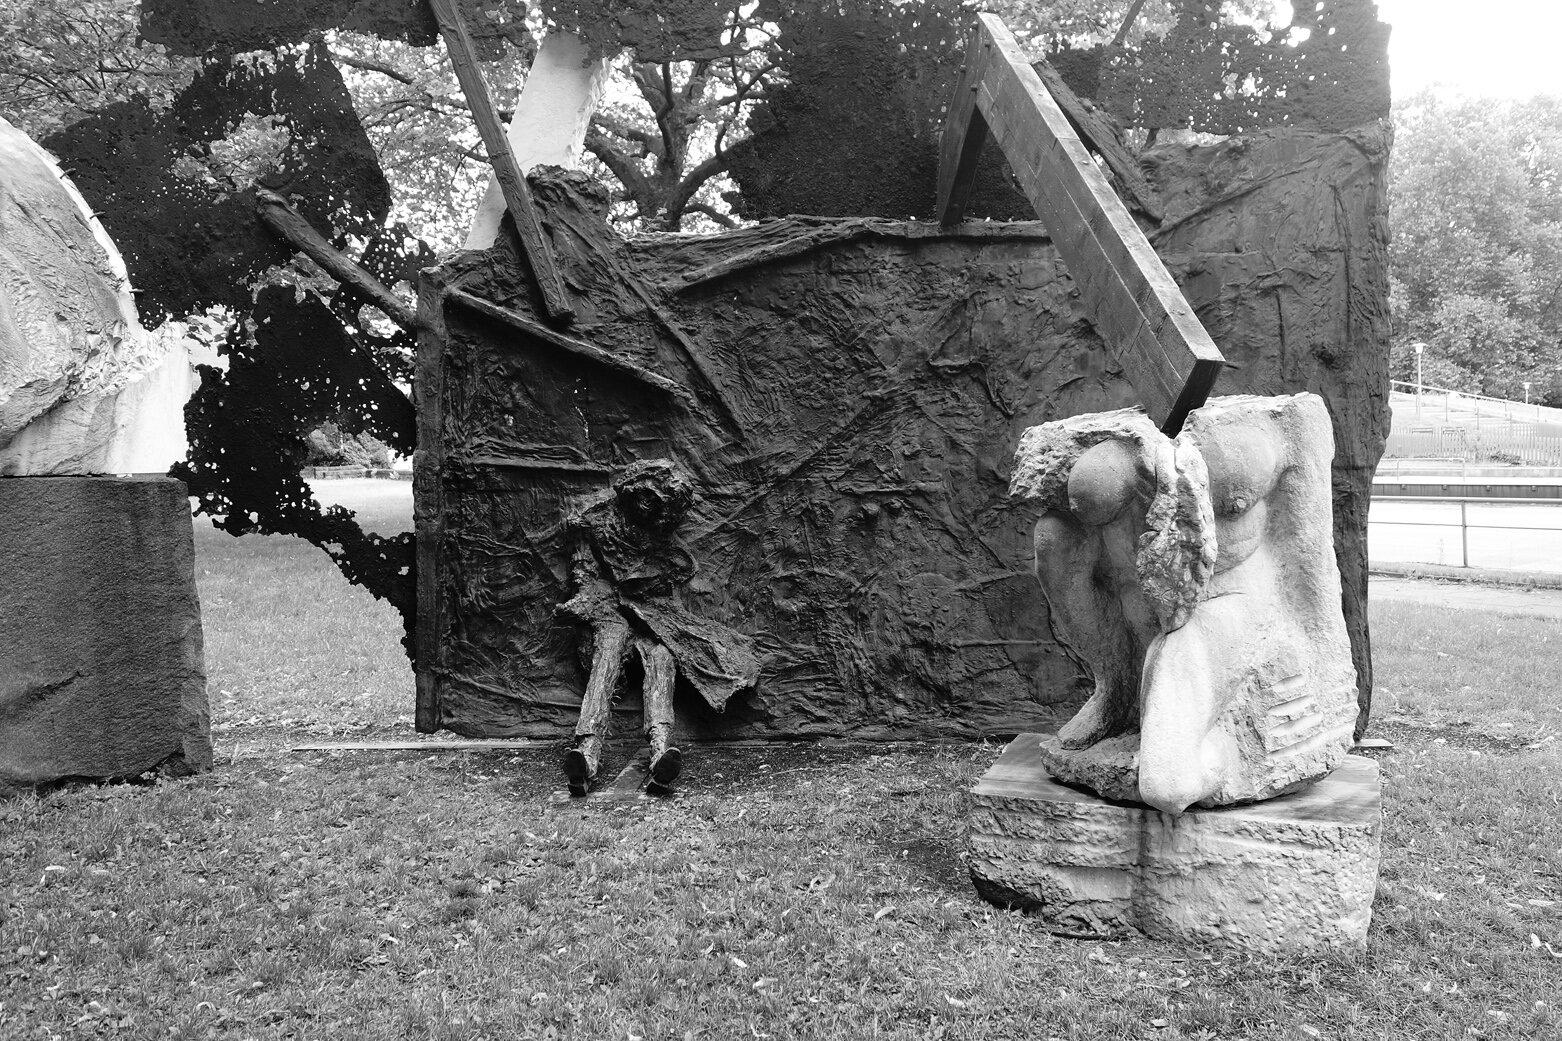 Fragment of Alfred Hrdlicka's sculpture, Hamburg, photo by Marek Domański.